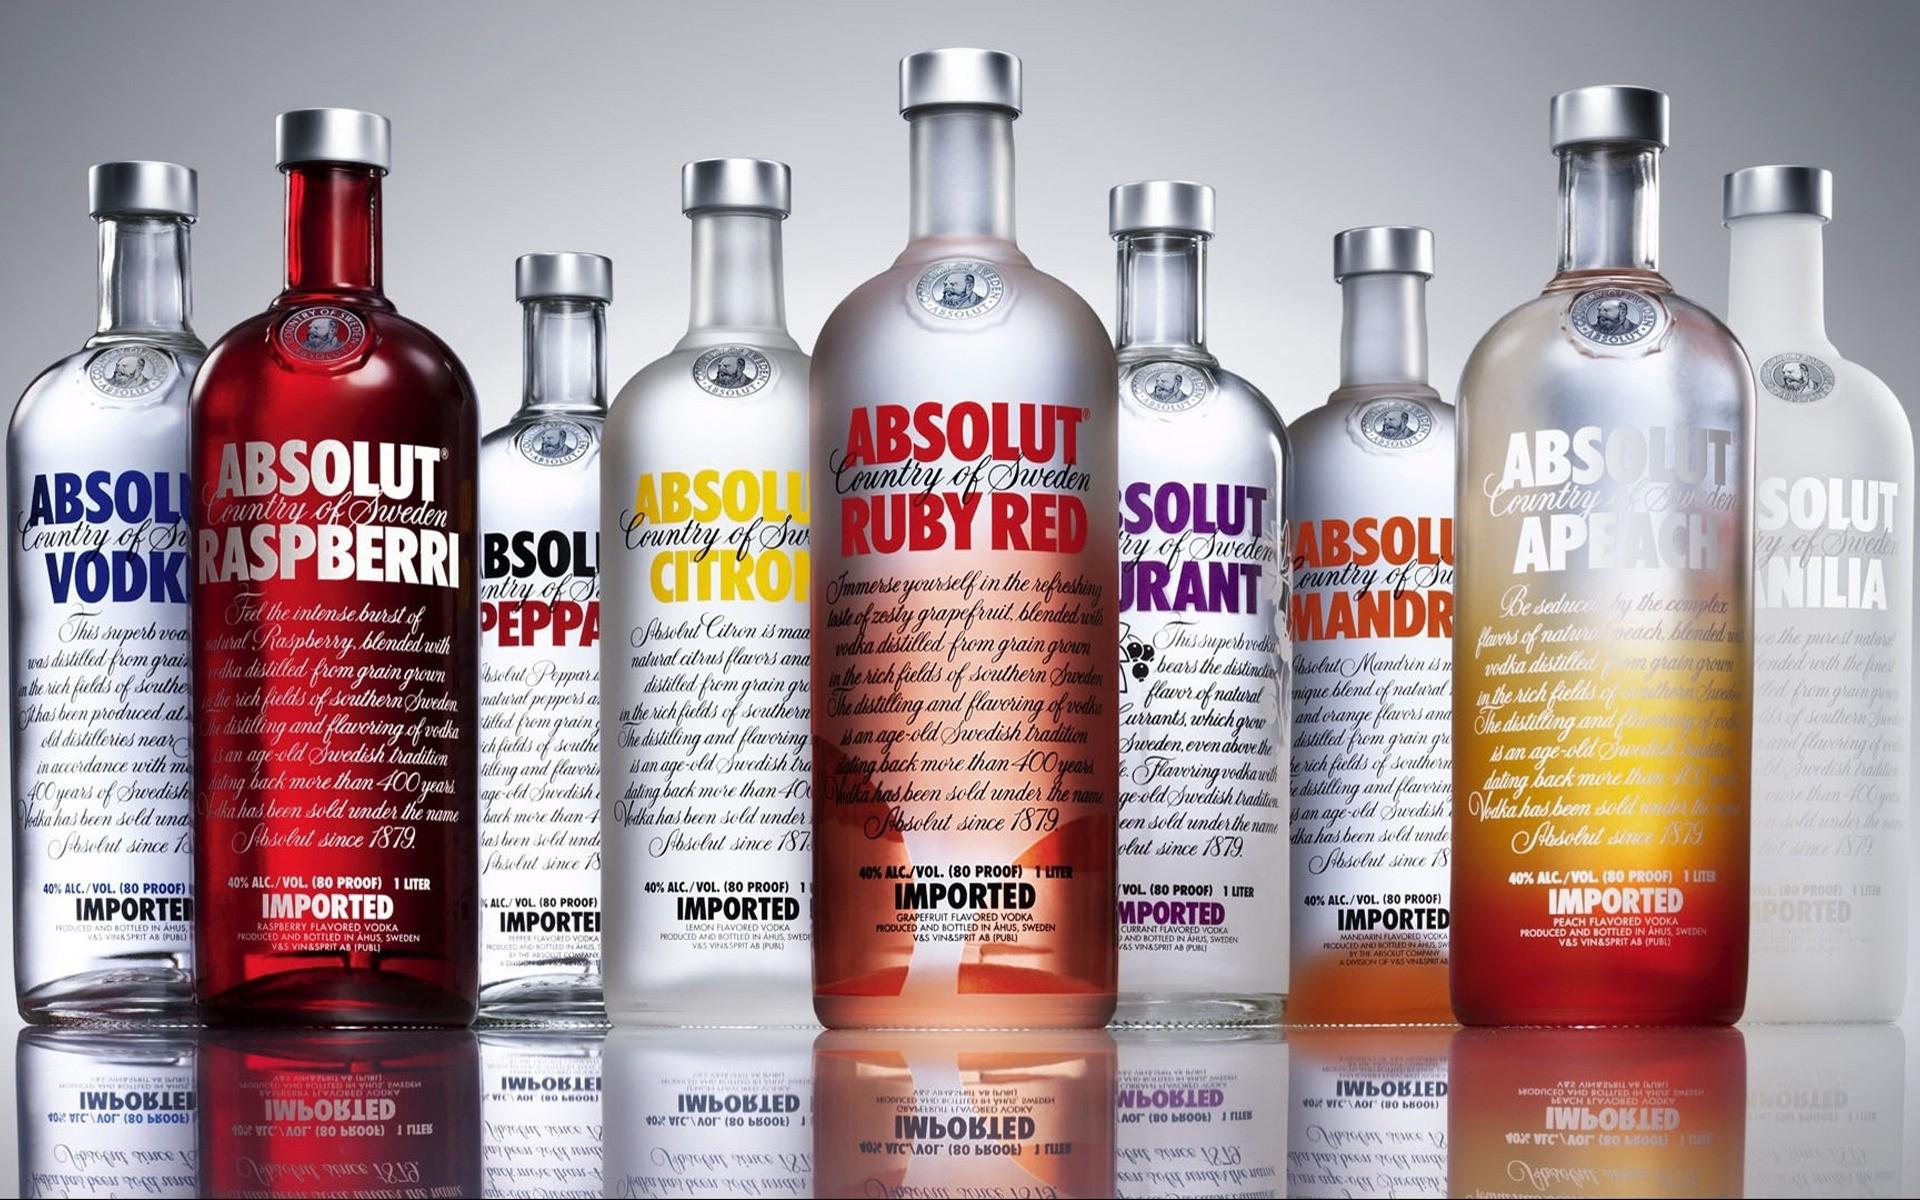 marketing of absolut vodka